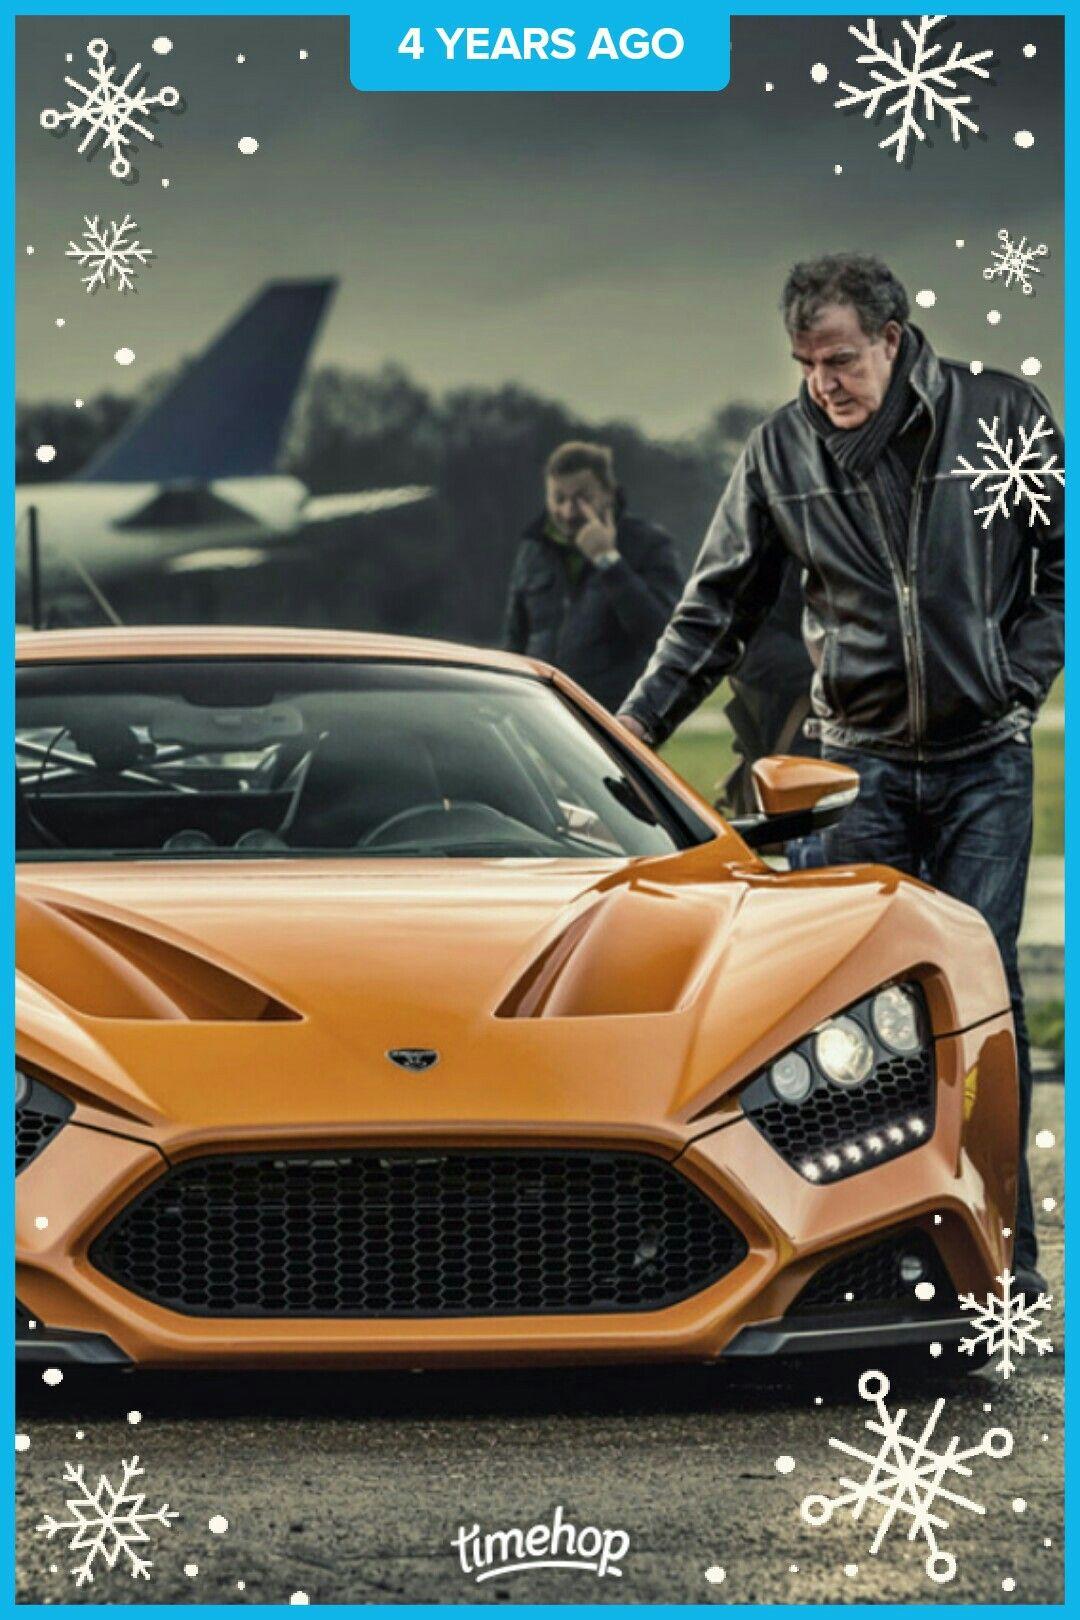 Zenvo ST1 Top Gear 2015 Front View | ZENVO ST1 | Pinterest | Top Gear And  Cars